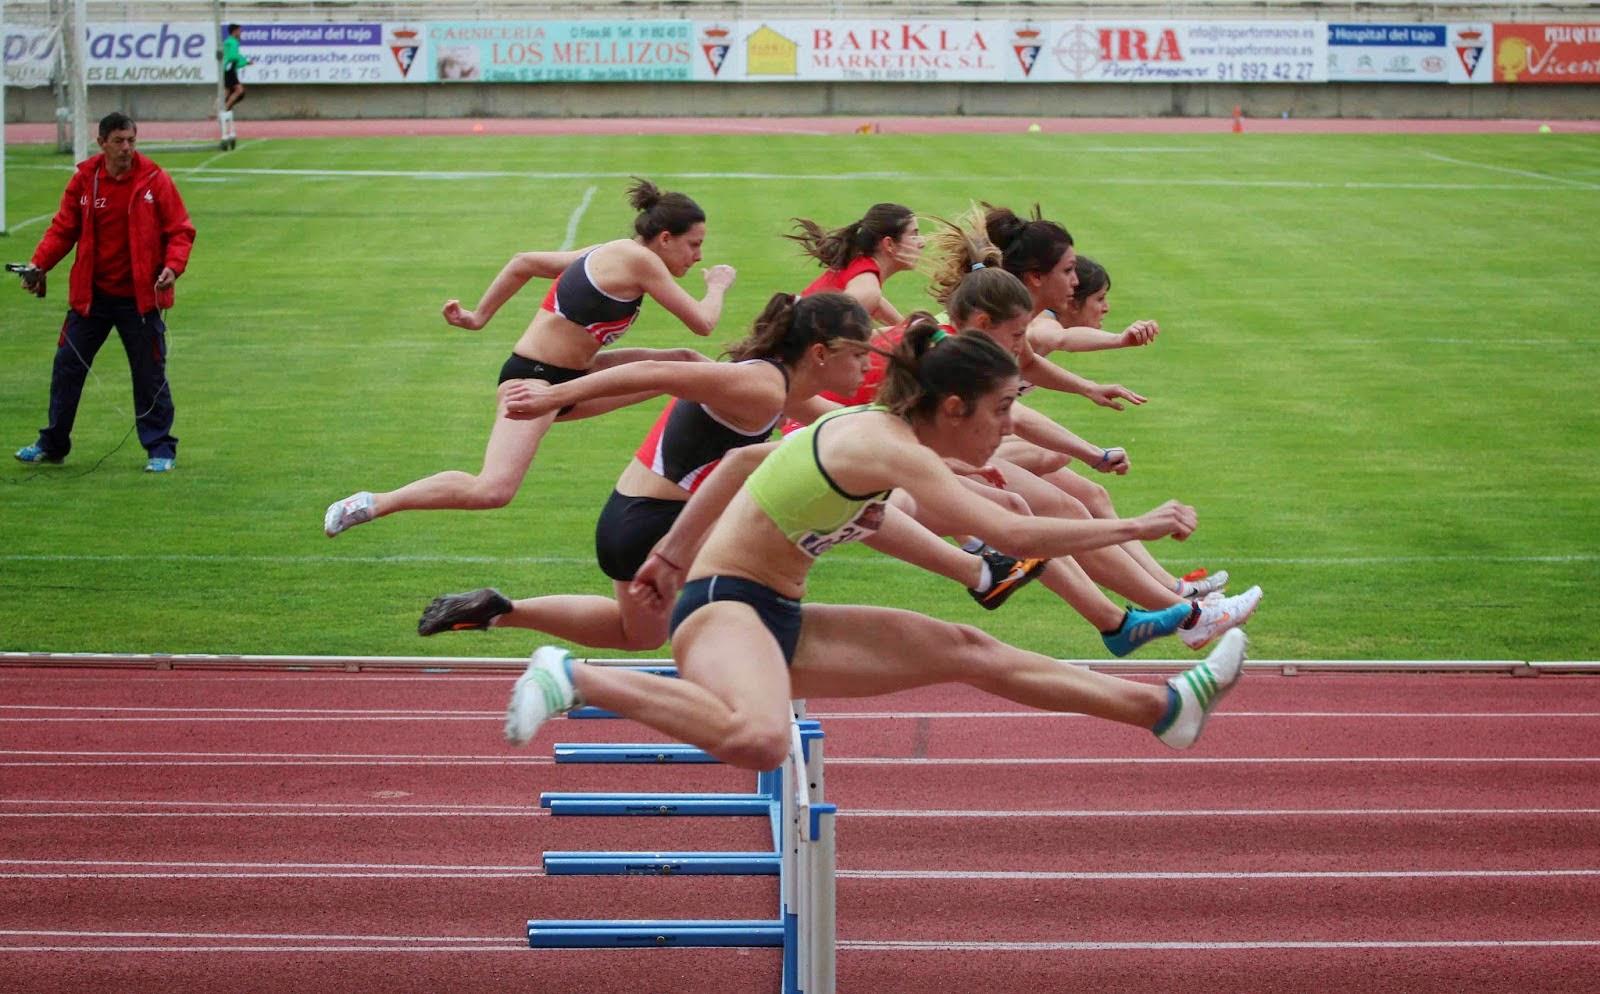 Efsevilla educar a trav s del deporte - Imagen de vallas ...